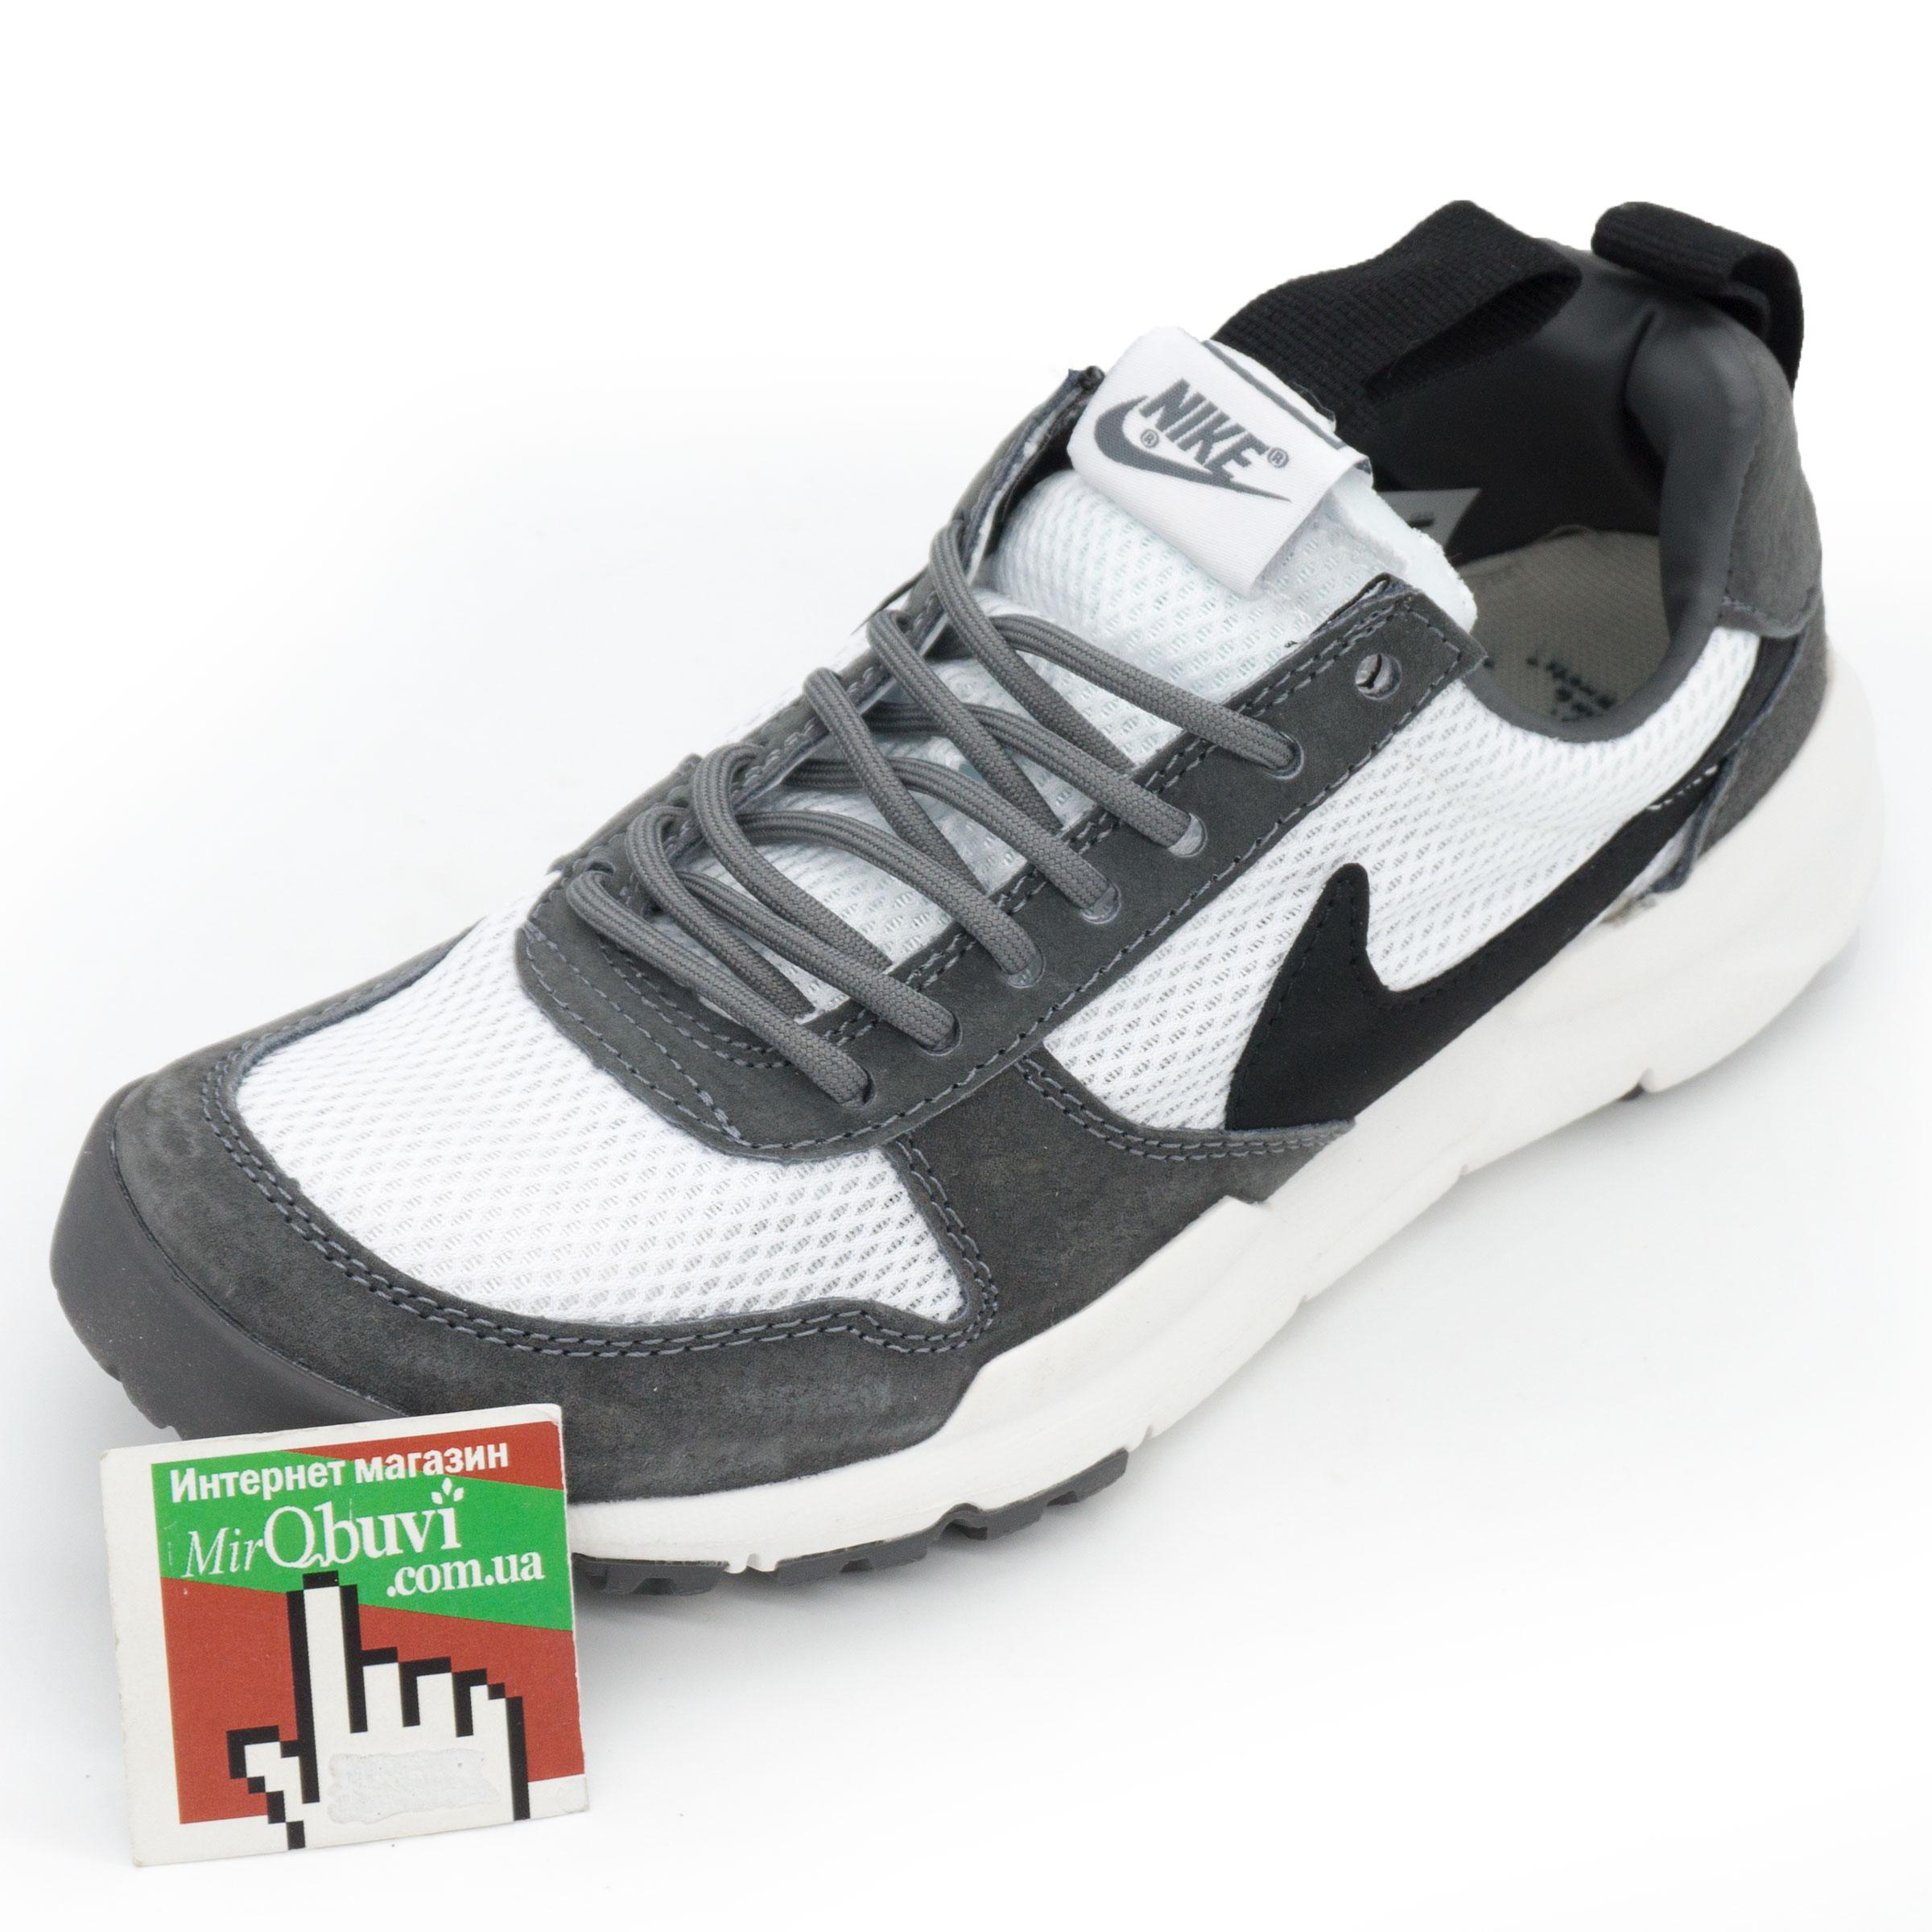 фото front Мужские кроссовки Nike Mars Yard 2.0 серые. Топ качество! front